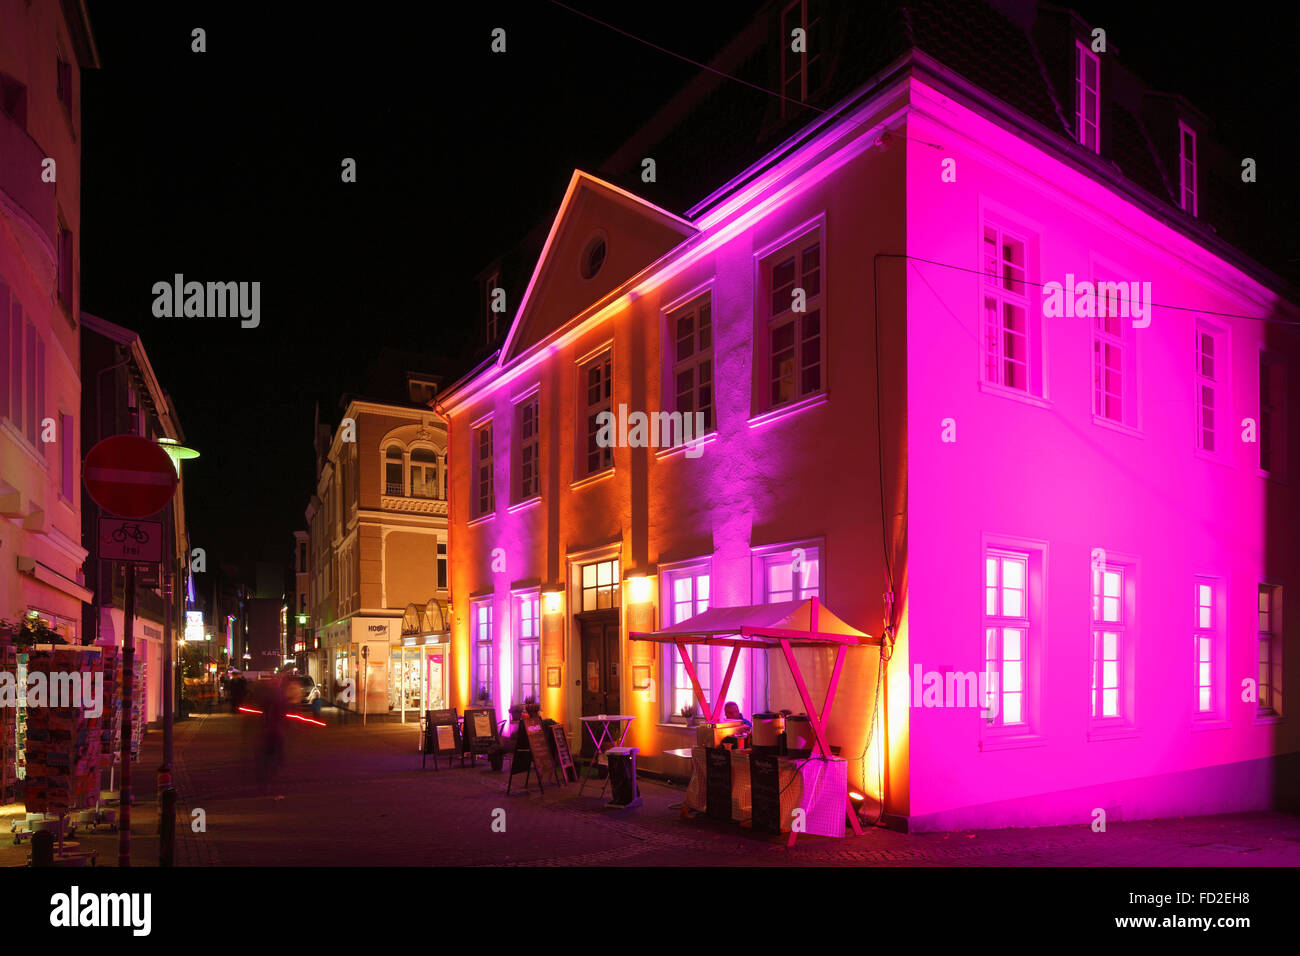 D-Recklinghausen, Ruhr area, Westphalia, North Rhine-Westphalia, NRW, 'Recklinghausen leuchtet', festival - Stock Image